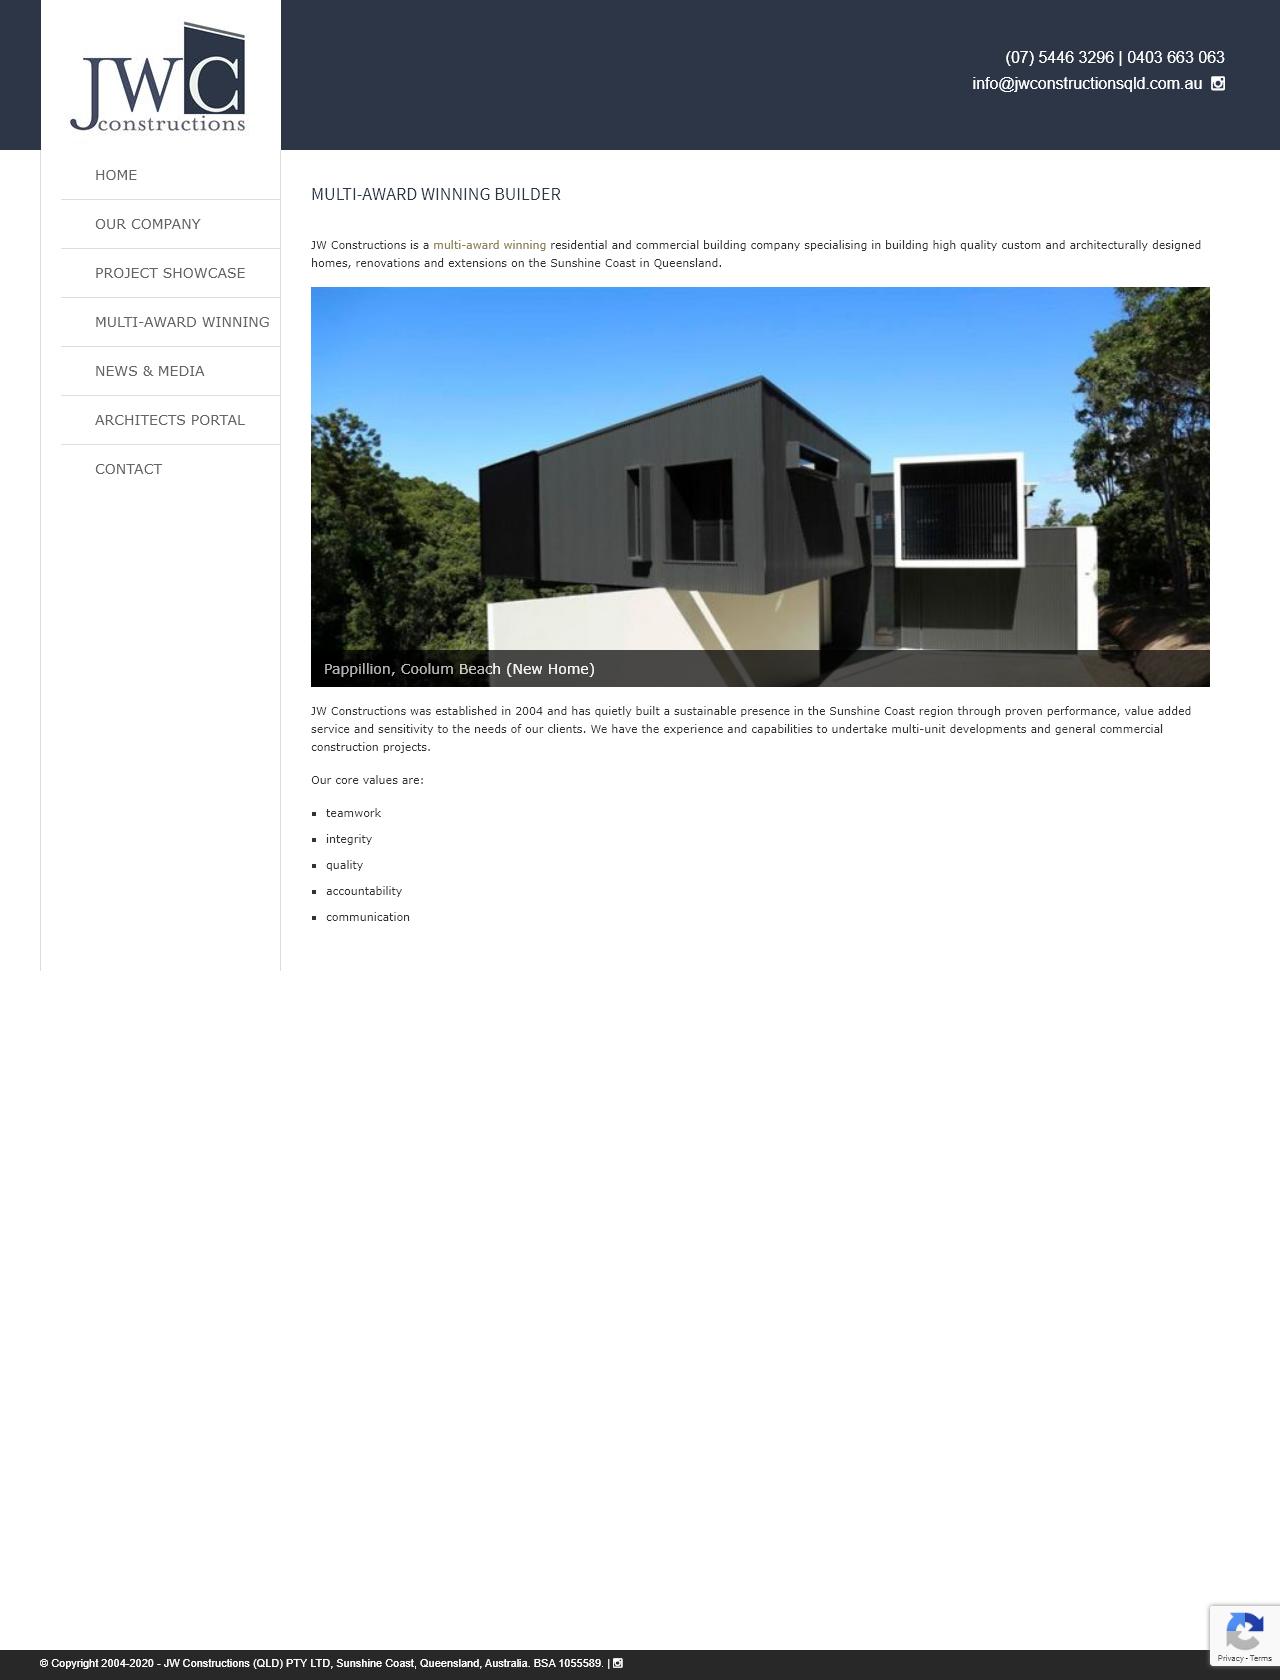 Screenshot Desktop - https://www.jwconstructionsqld.com.au/